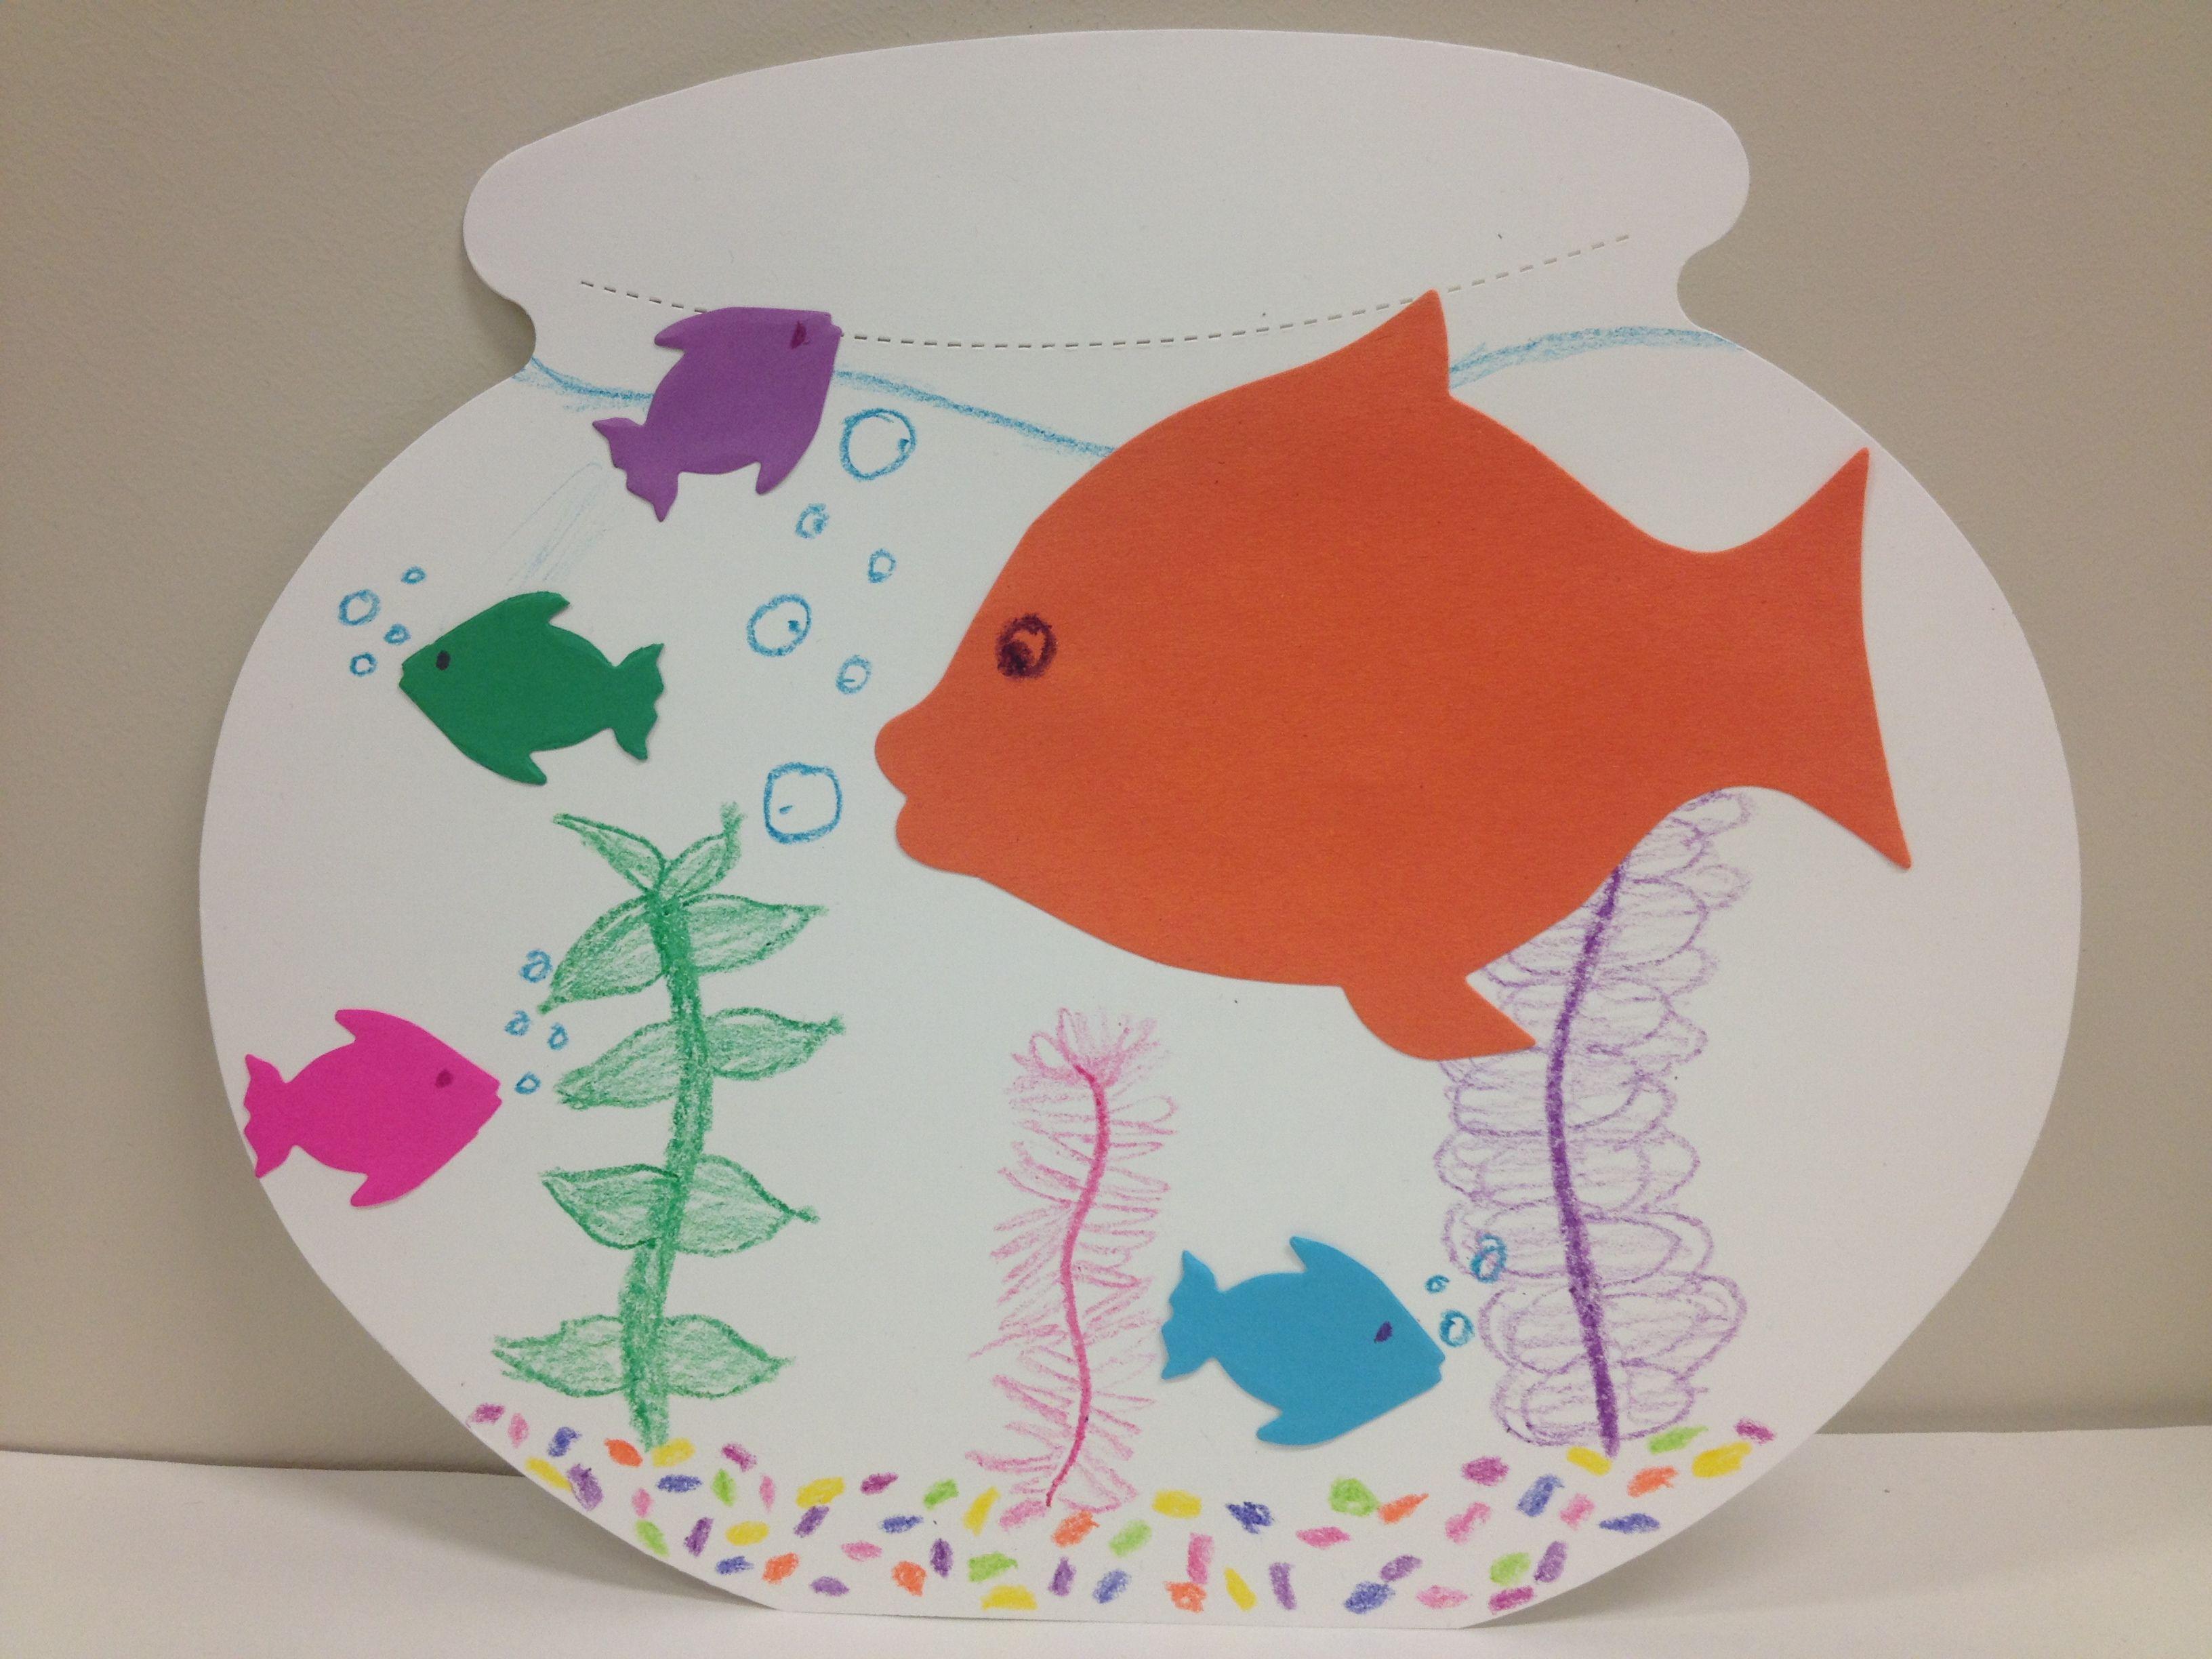 Pet Storytime! | Pinterest | Craft, Pet theme and Creative curriculum